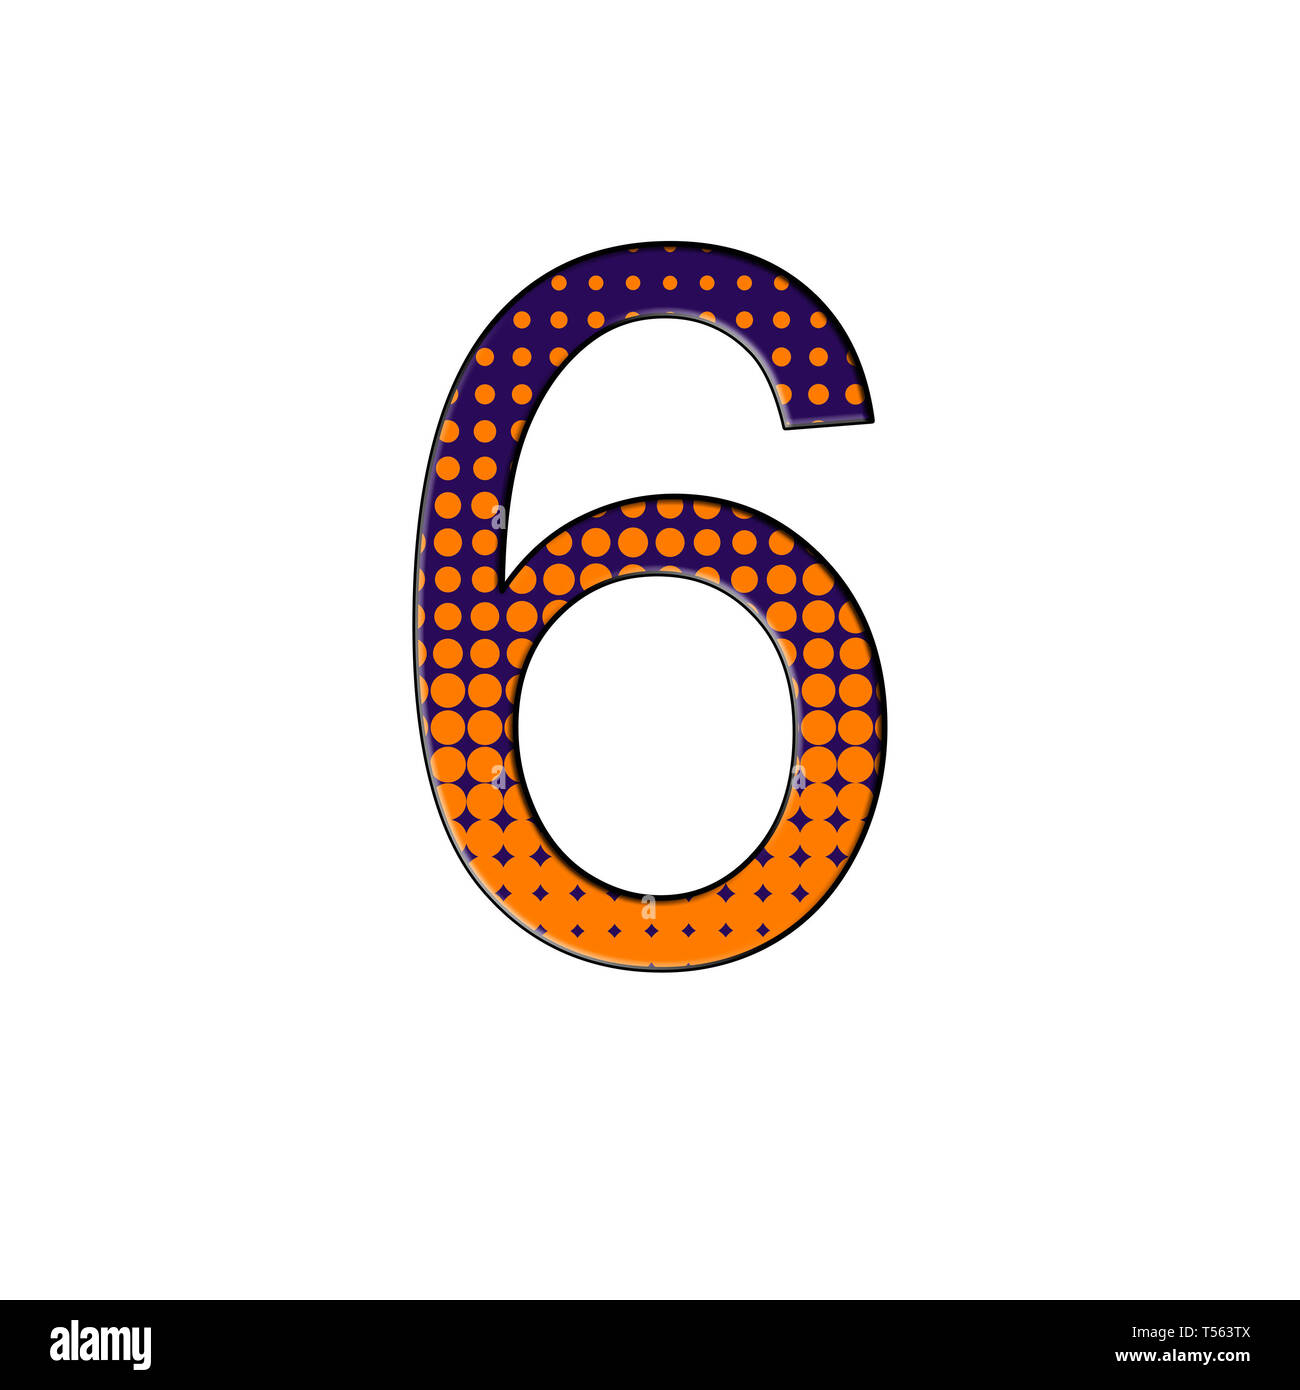 Number 6 illustration on isolated white background. Halftone duotone gradient. - Stock Image